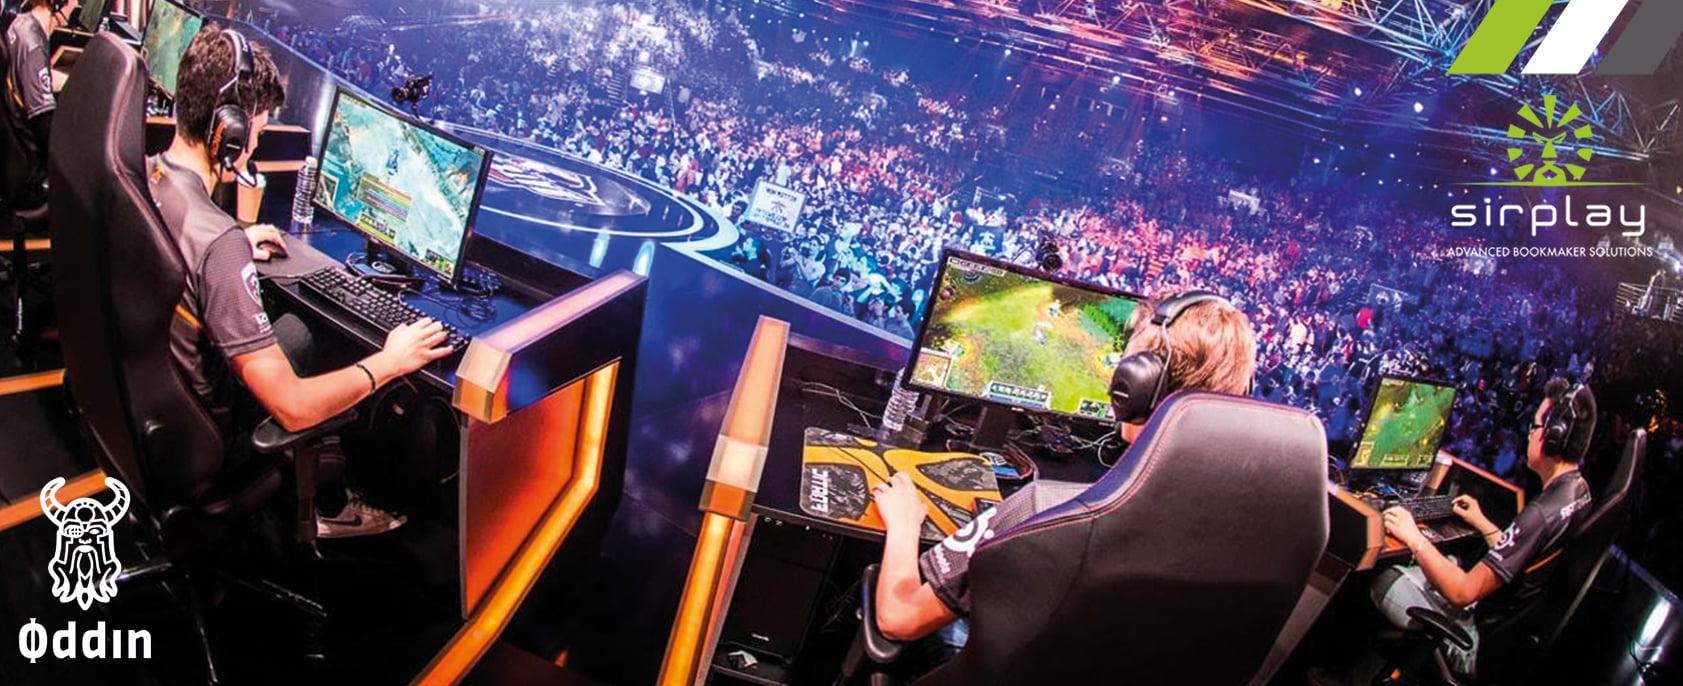 esports betting platform sirplay oddin.gg